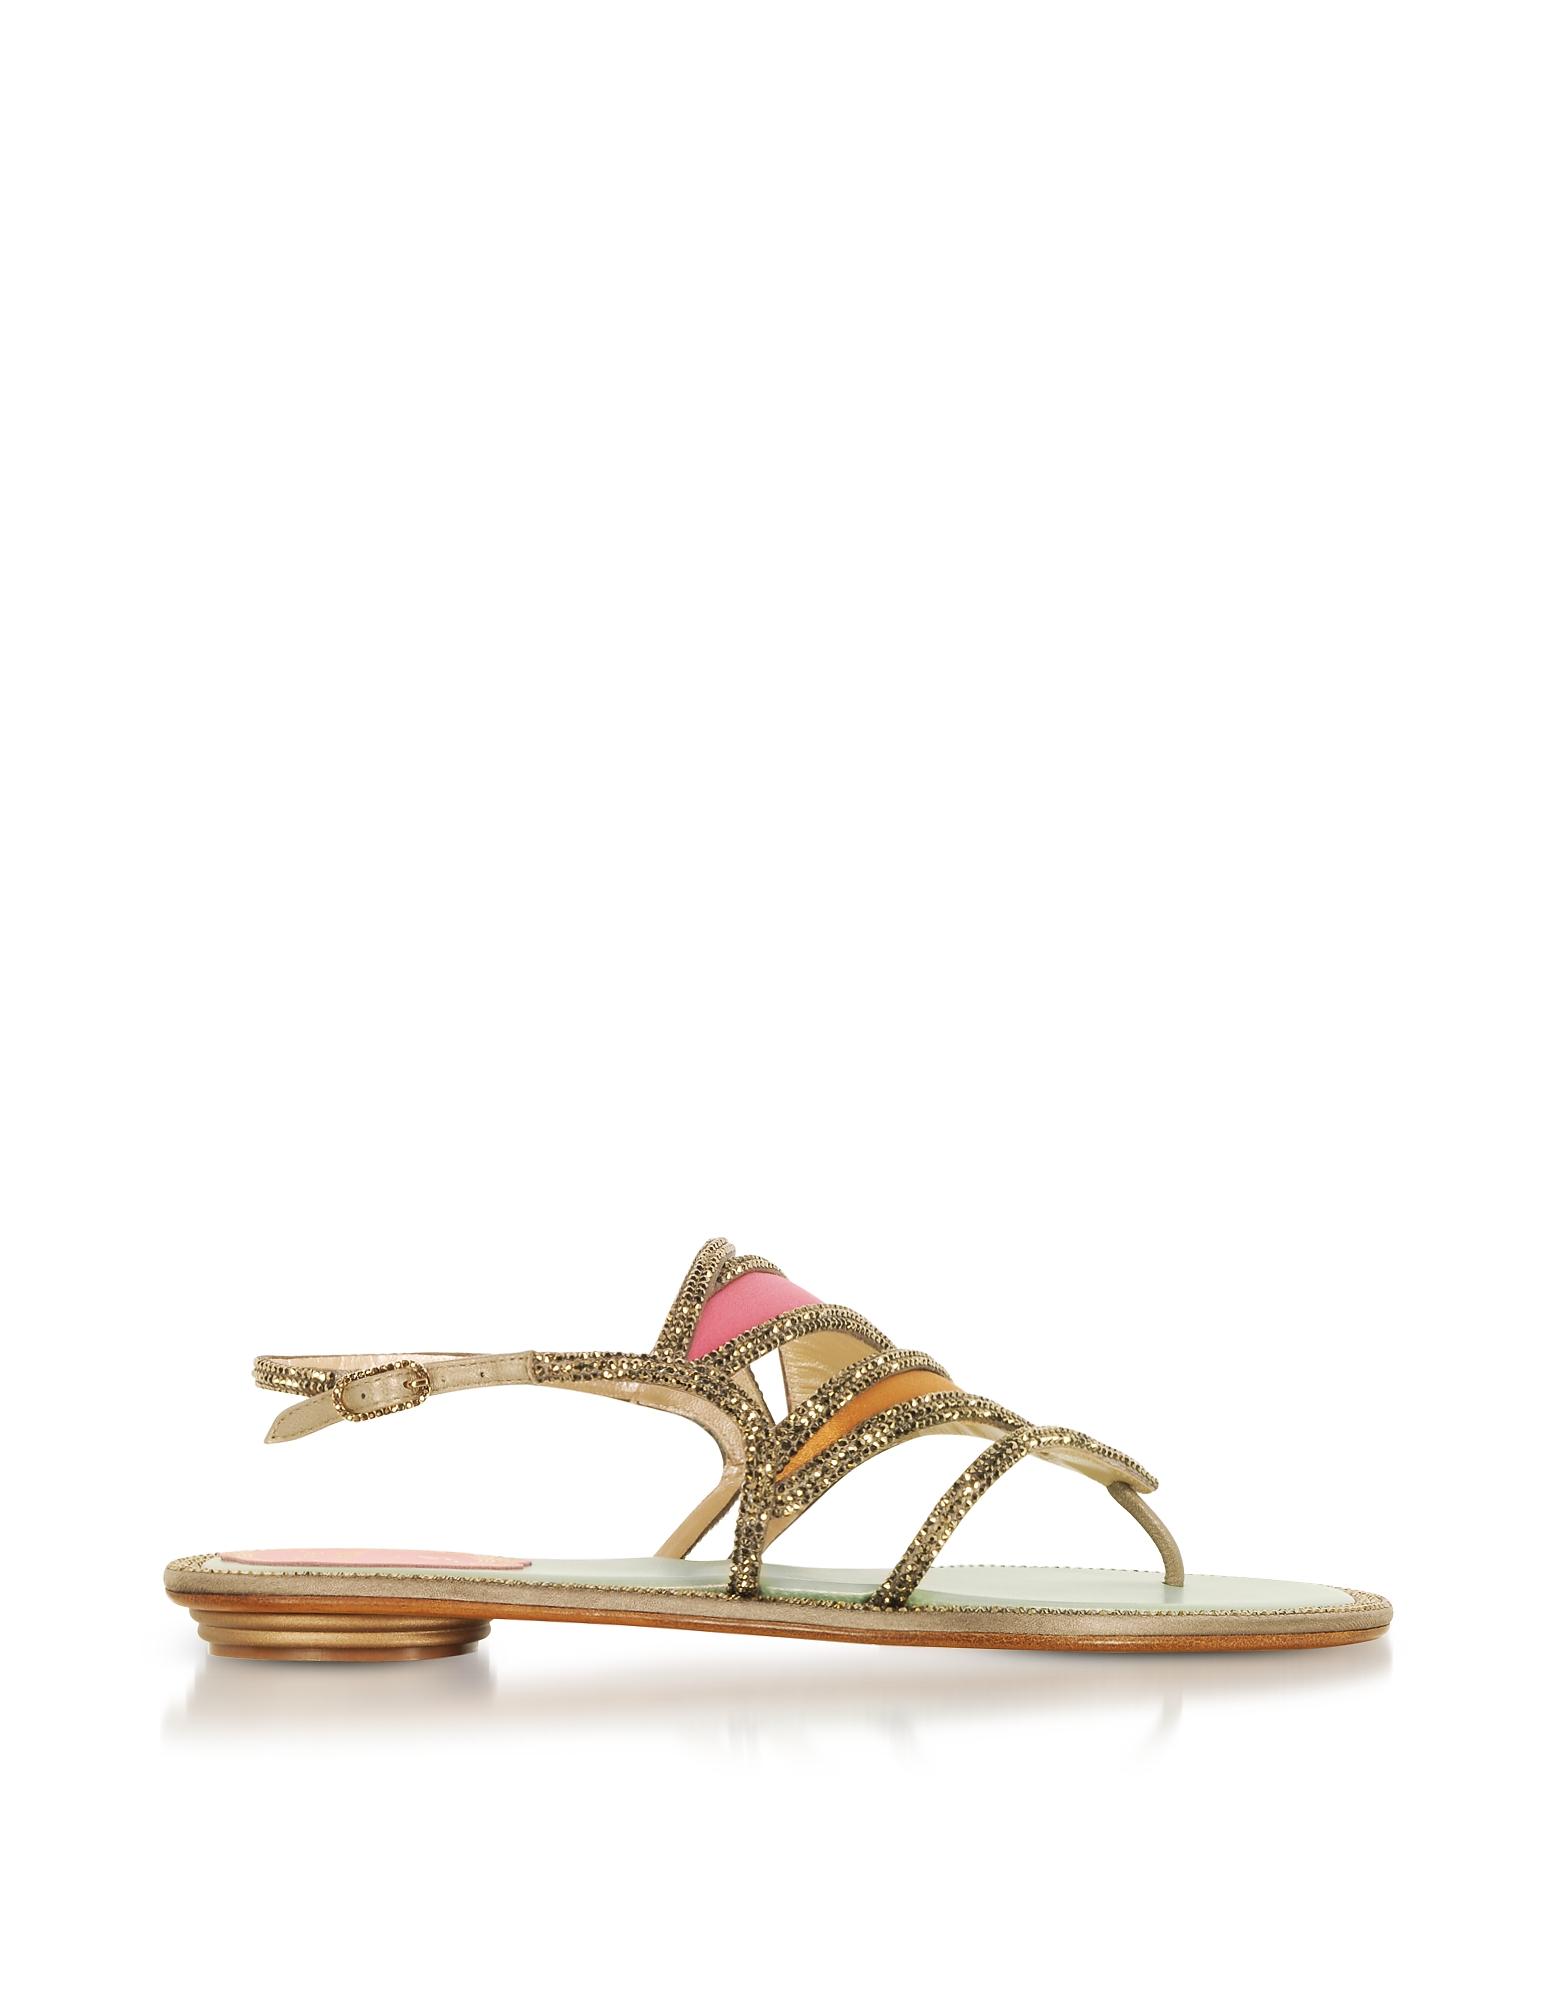 Rene Caovilla Shoes, Kandinsky Satin and Metallic Light Gold Flat Sandals w/Strass